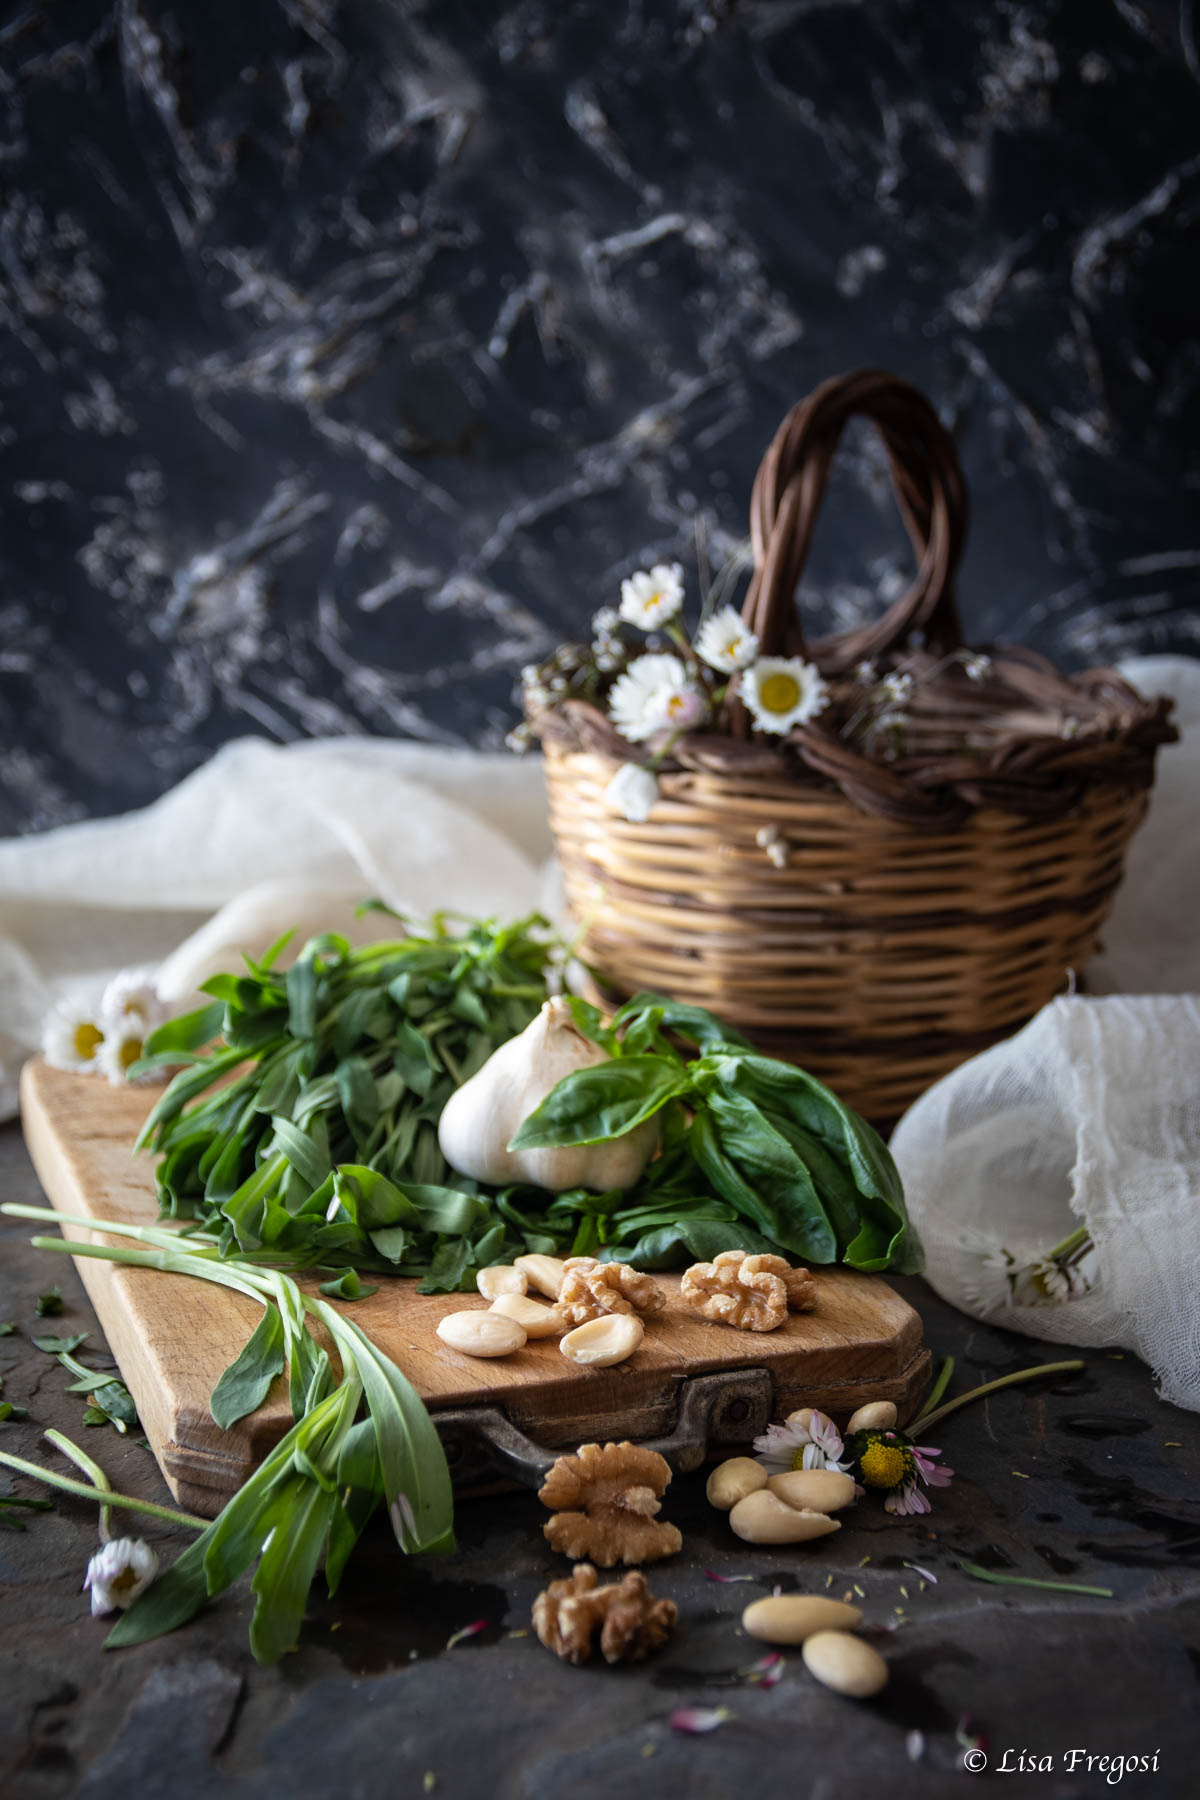 ricetta del pesto senza cottura delle strigoli o stridoli